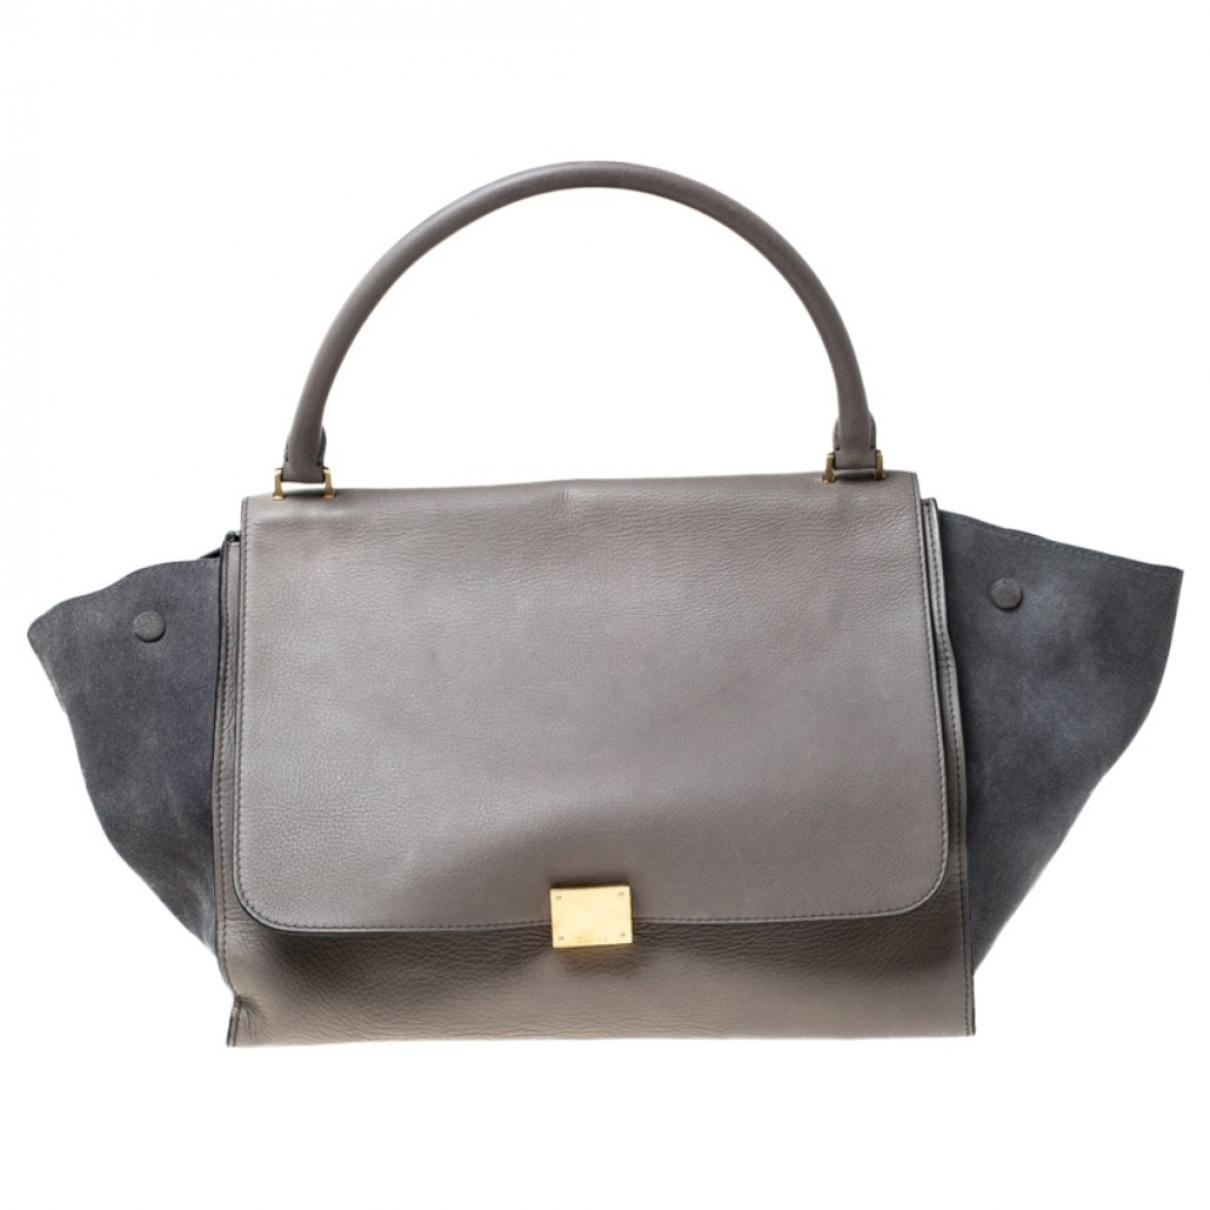 Celine Trapeze Handtasche in  Grau Leder